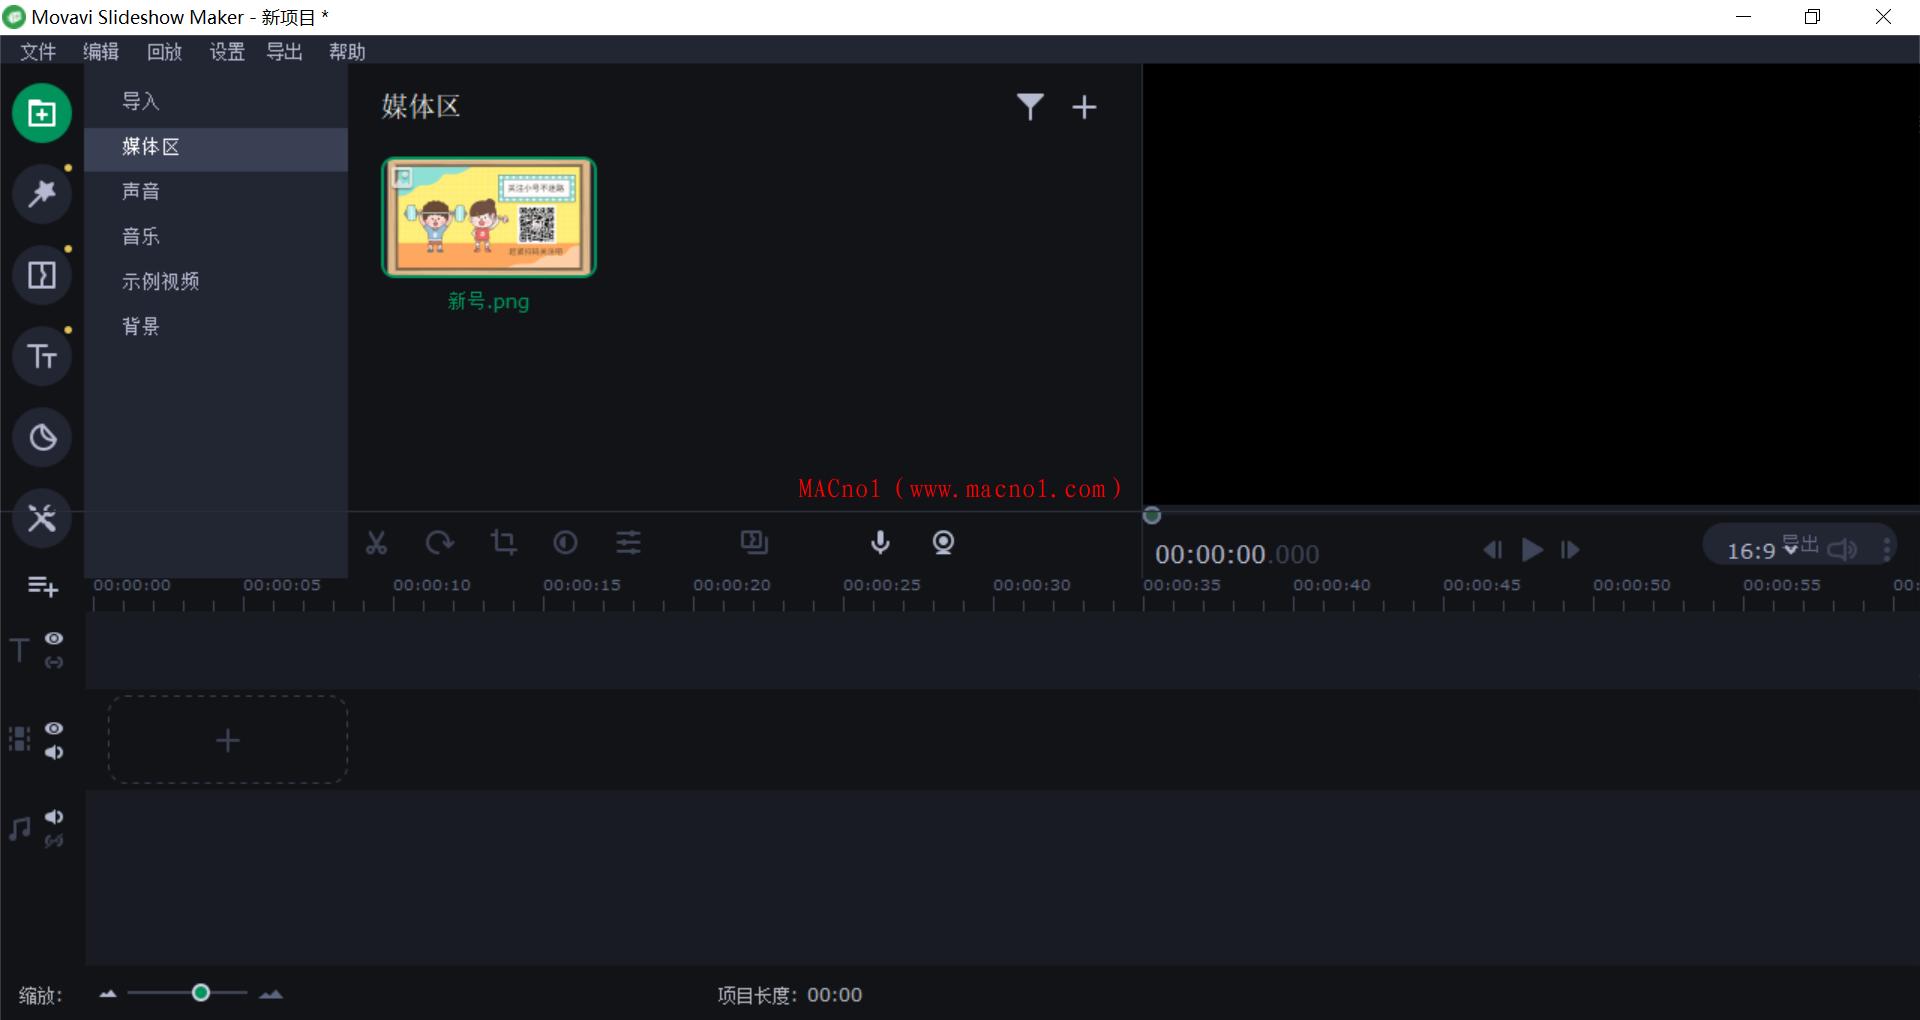 Movavi Slideshow Maker 破解版 (2).png